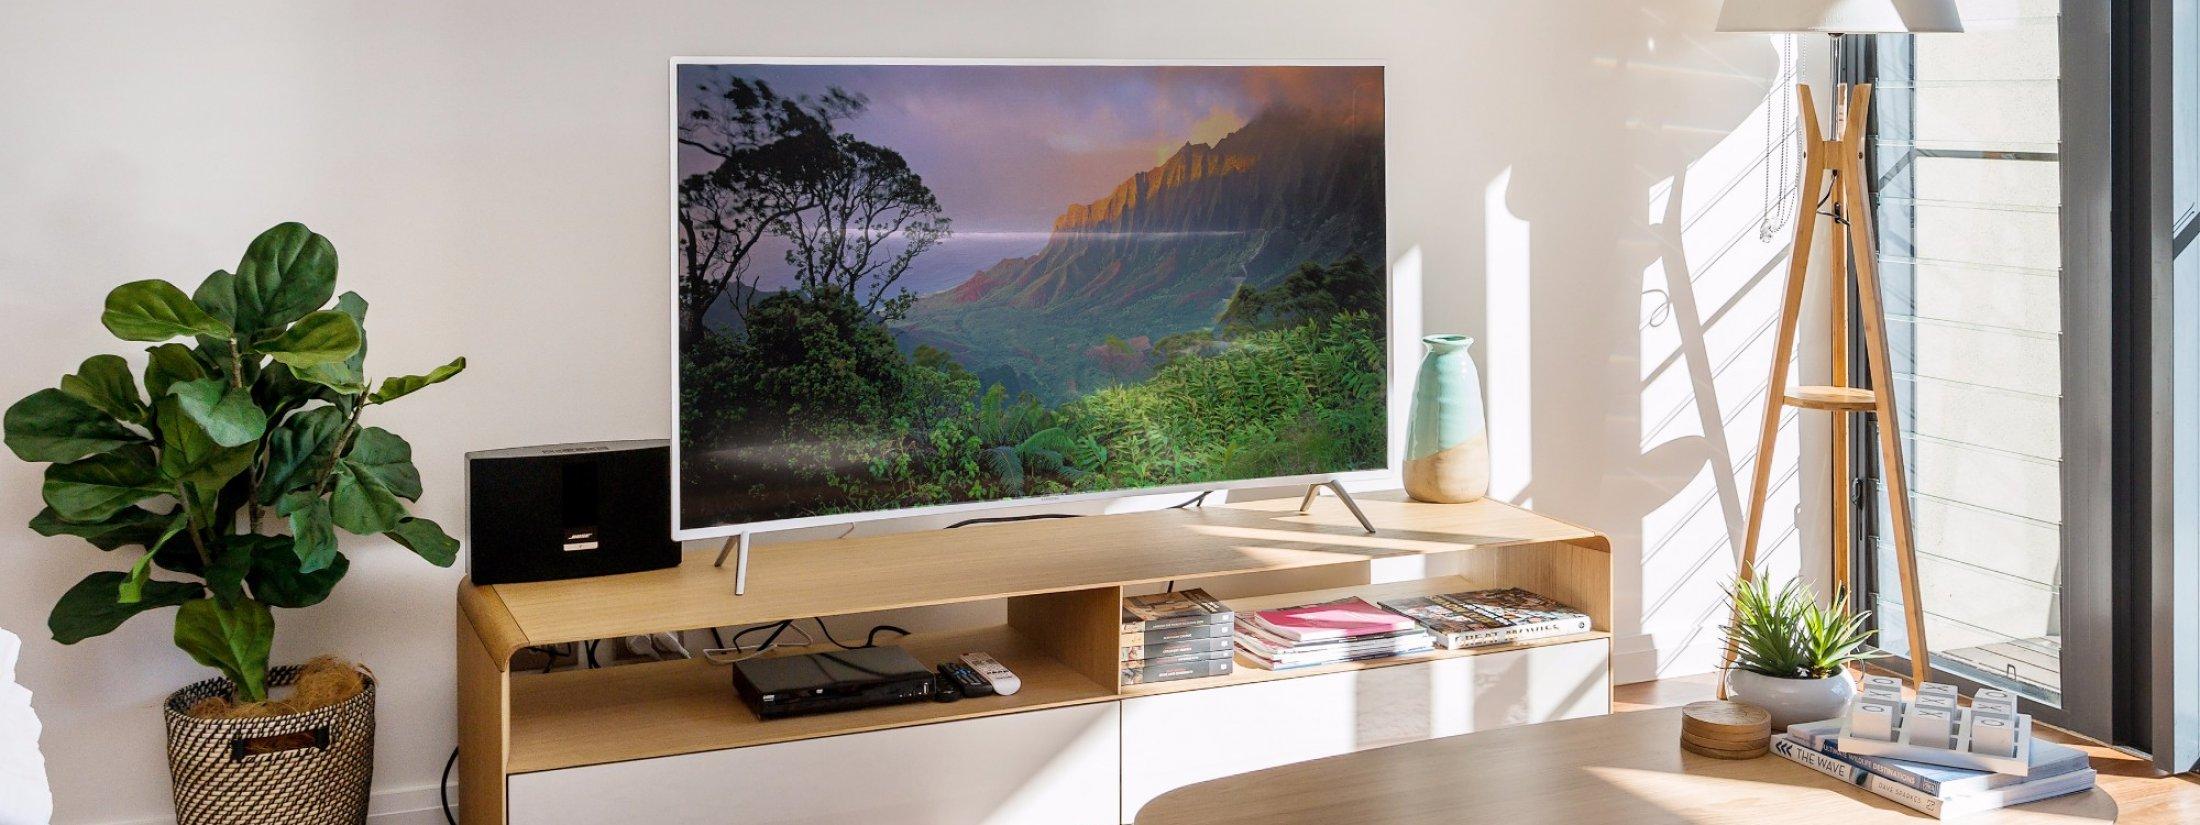 Kiah Beachside - Belongil Beach - Byron Bay - large curved screen TV